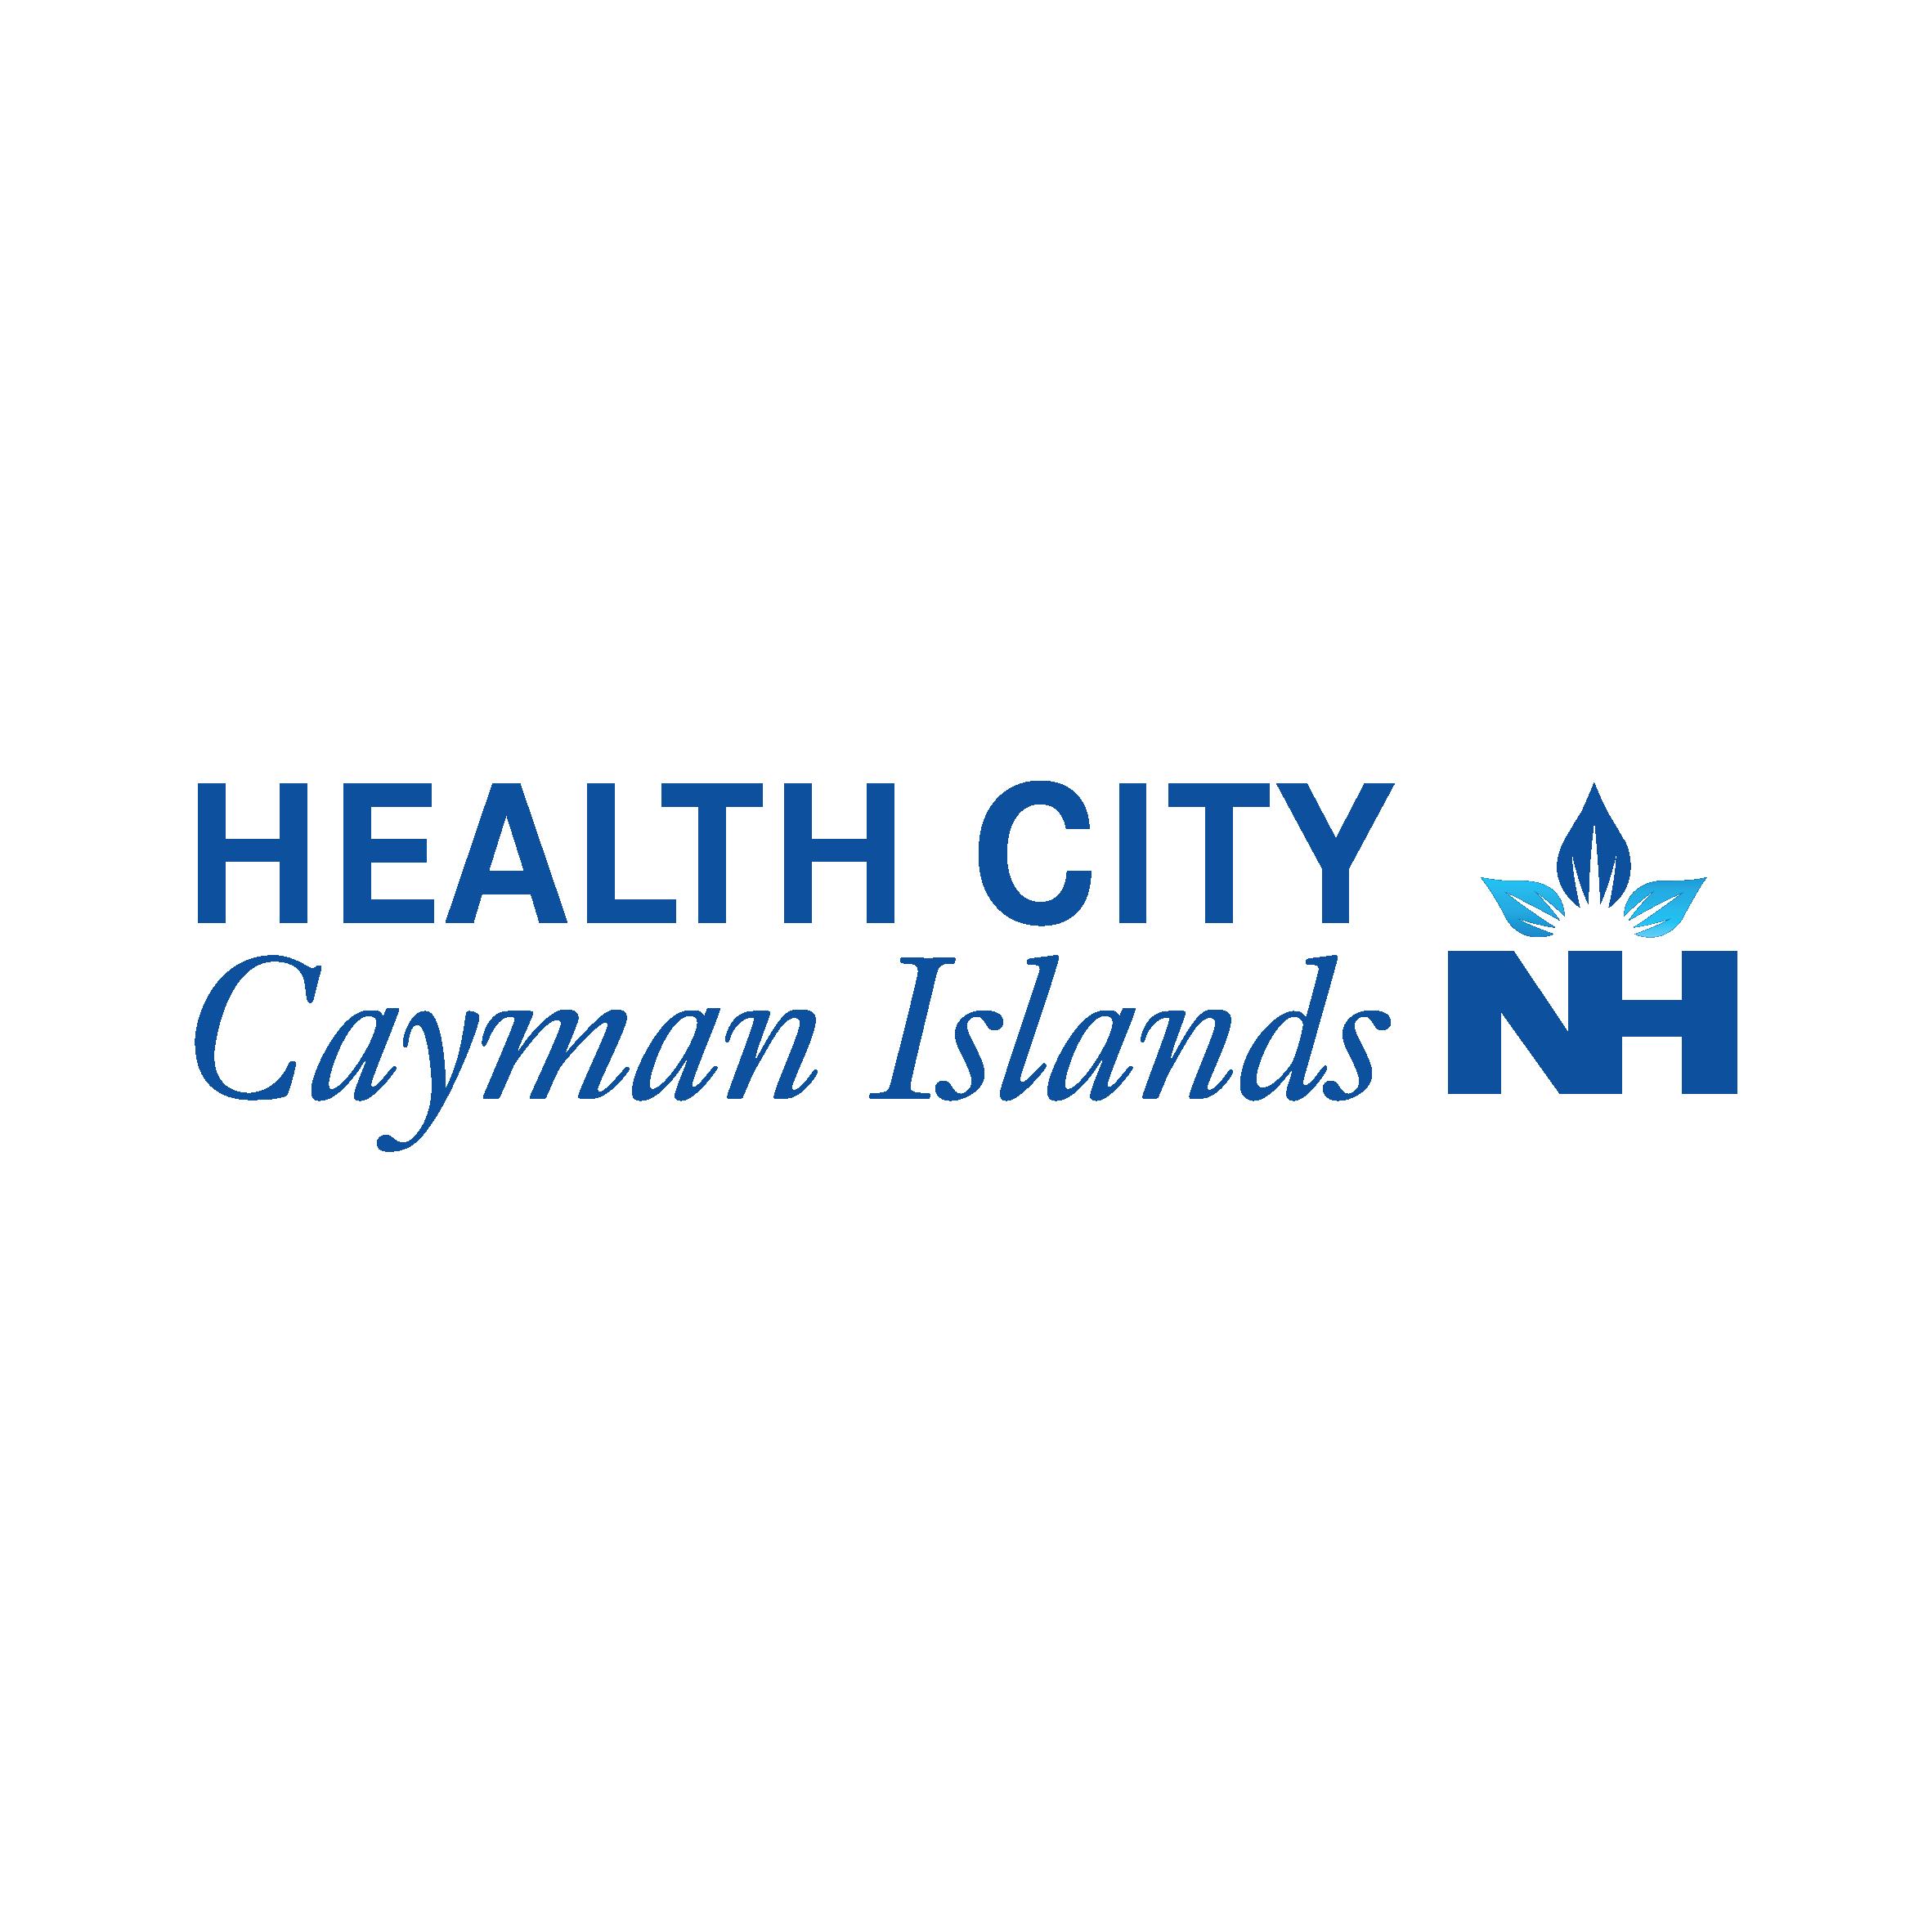 Health City Cayman Islands logo.